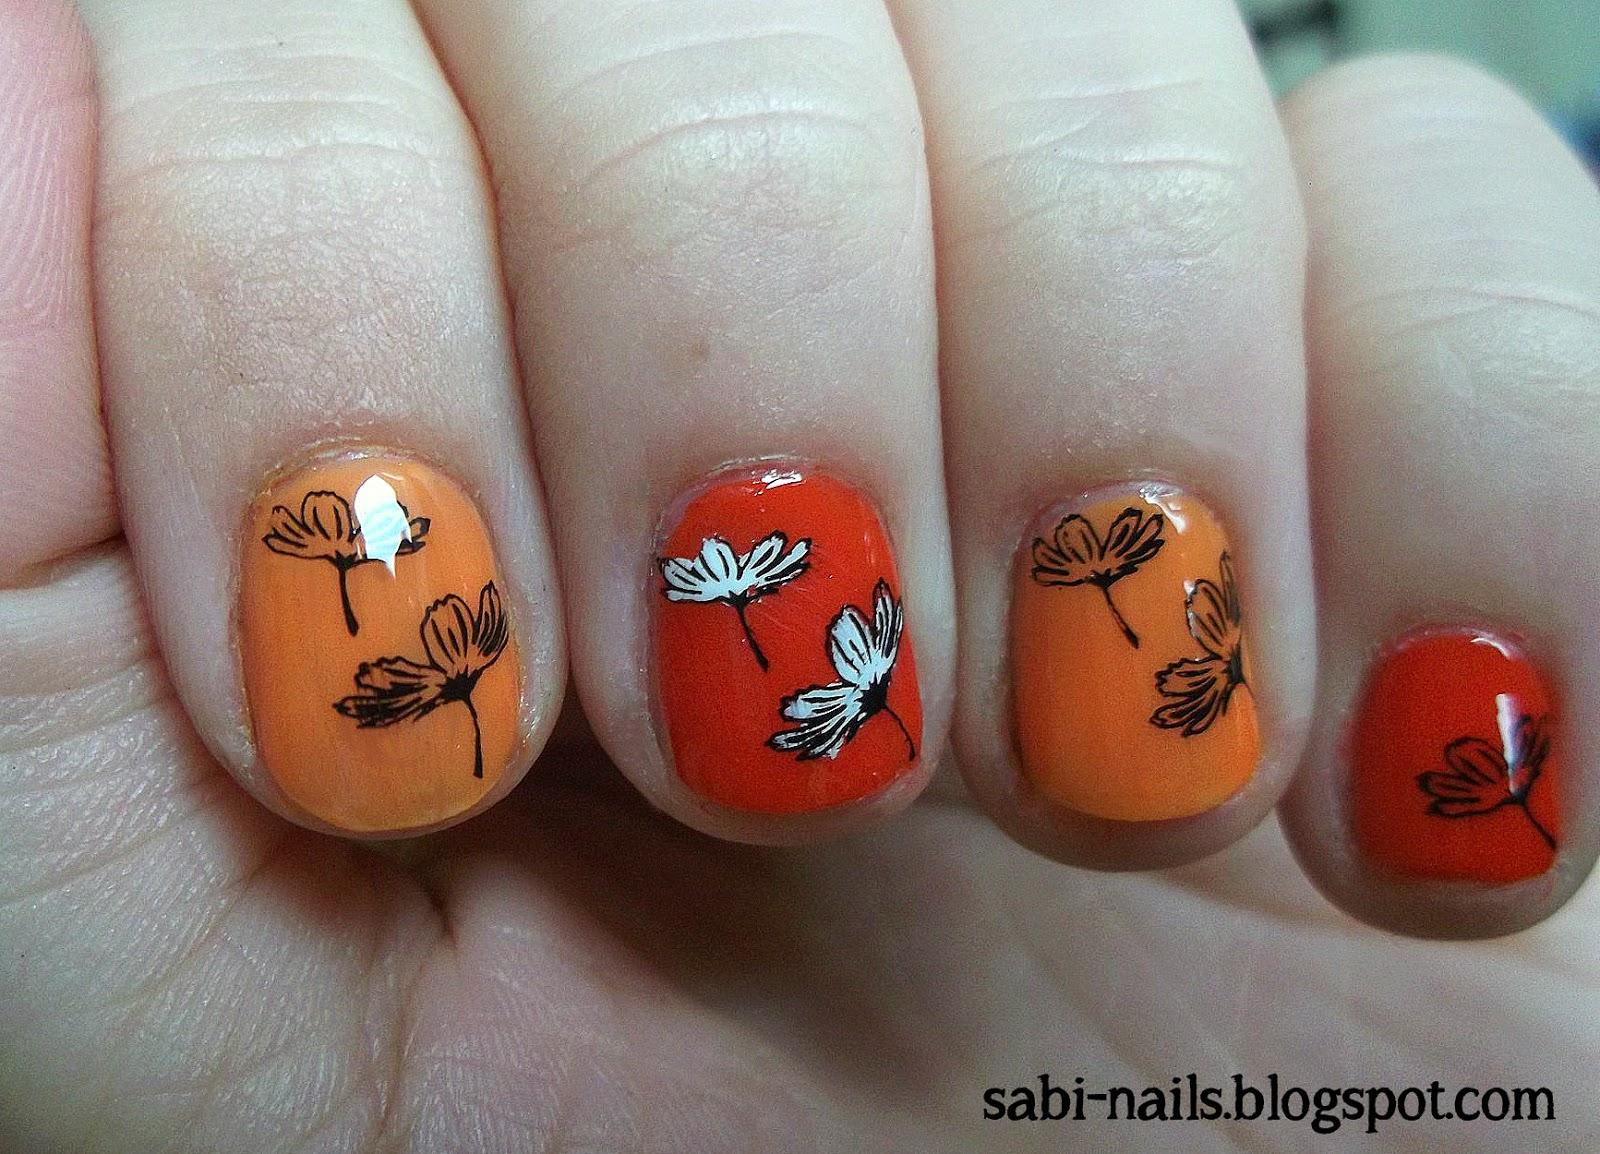 http://sabi-nails.blogspot.com/2014/02/hej-dzisiaj-zdobienie-na-dugosci-mini.html